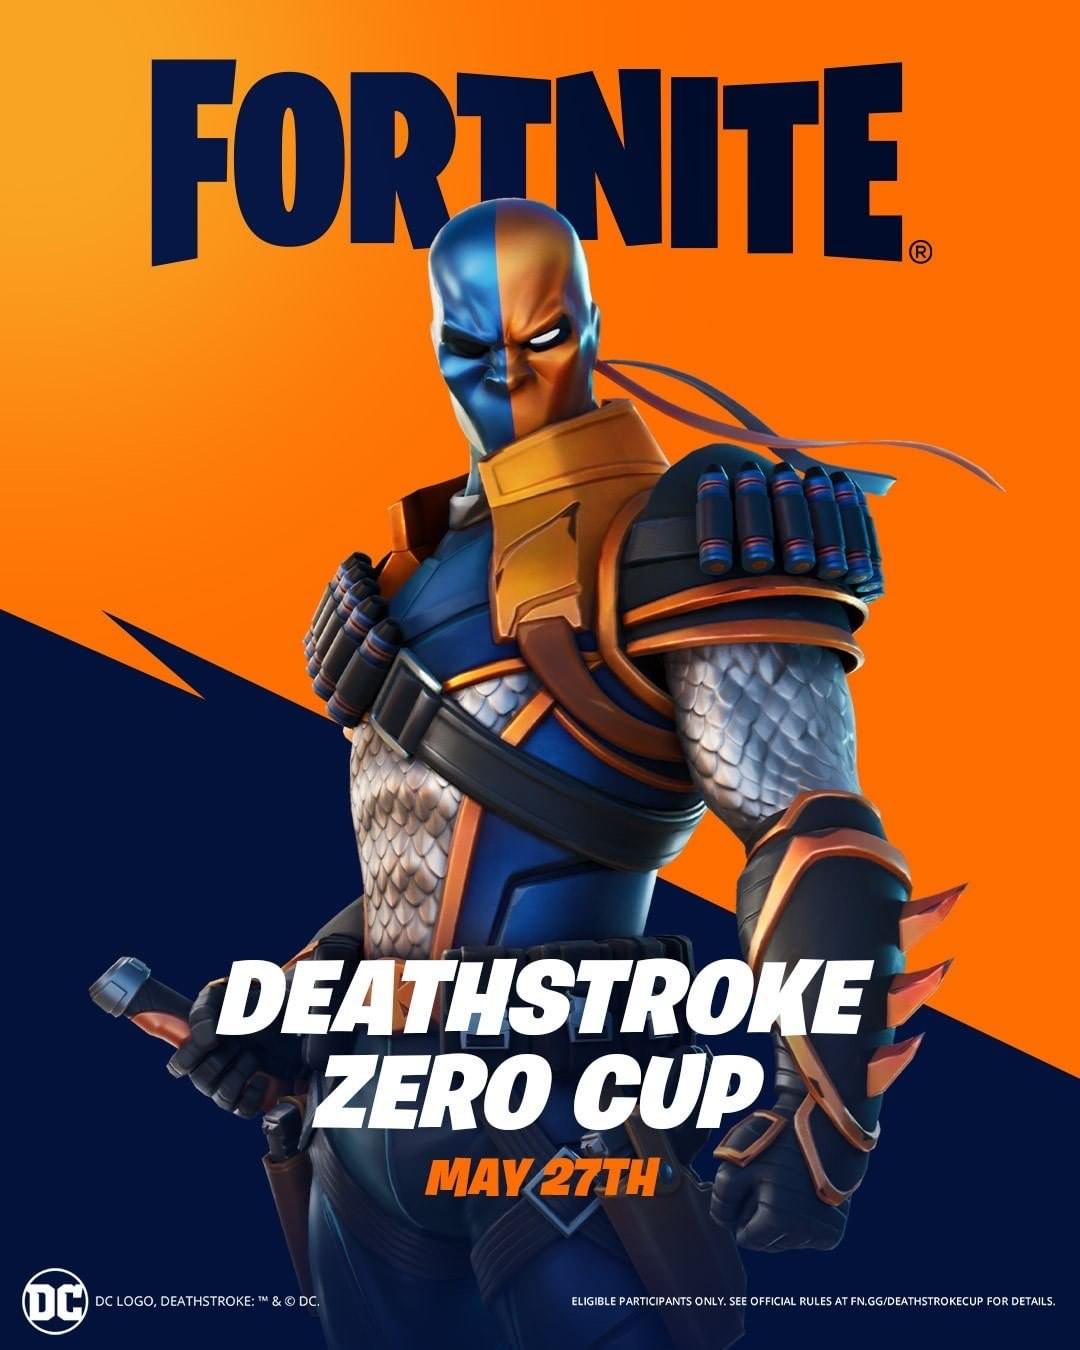 Deathstroke Zero Cup. FREE DC Deathstroke FORTNITE skin @ Epic Games